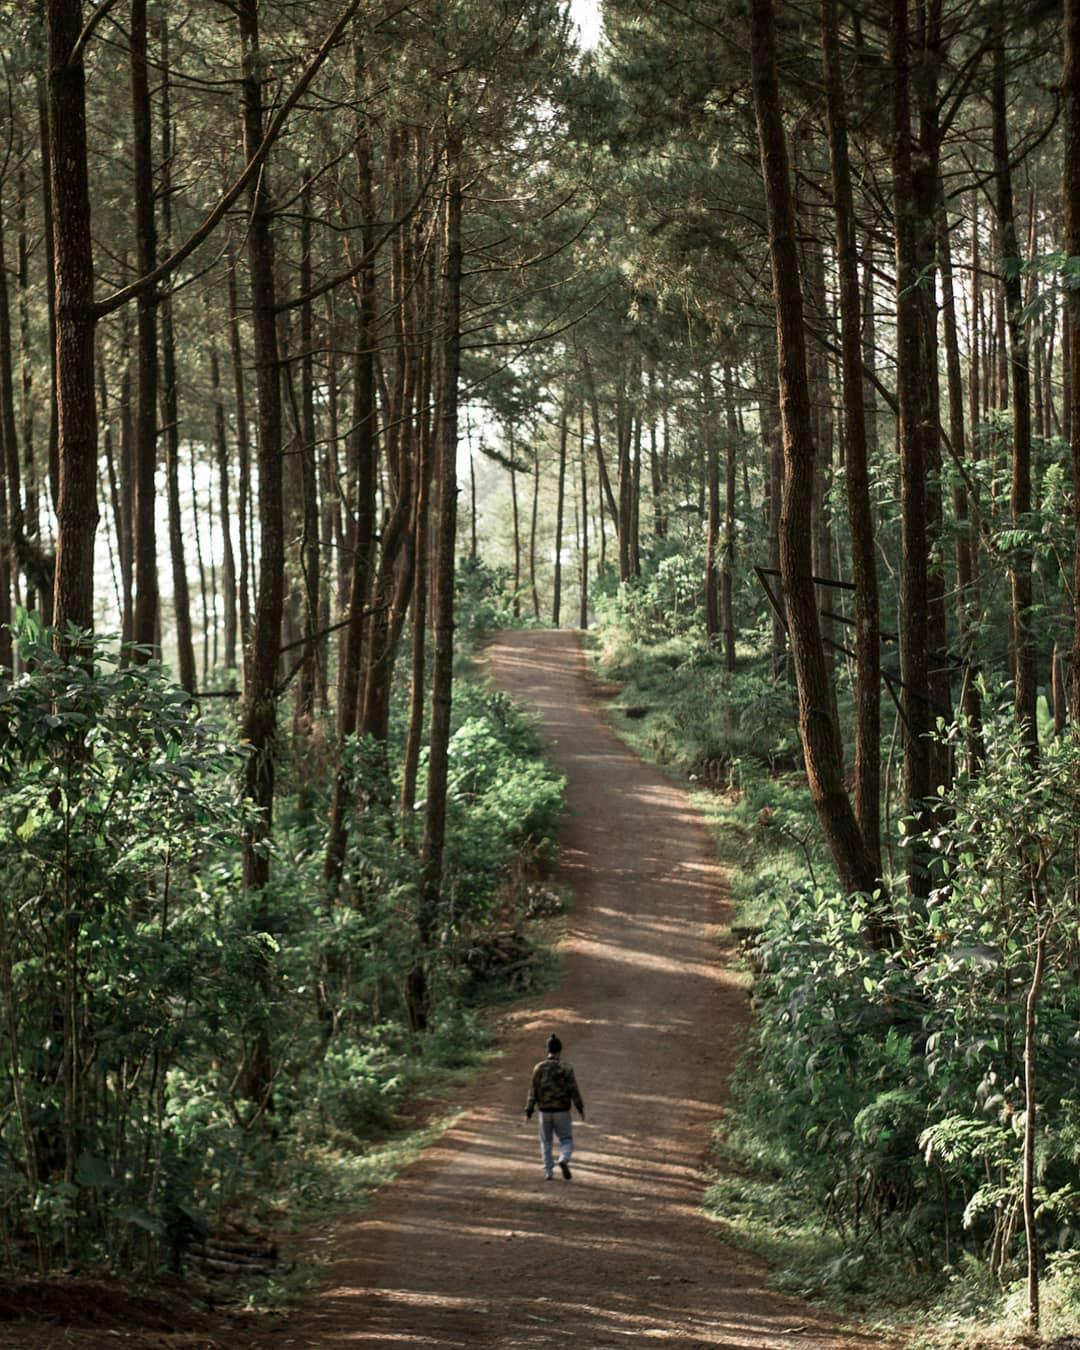 10 Destinasi Wisata Di Purworejo Yang Bikin Melongo